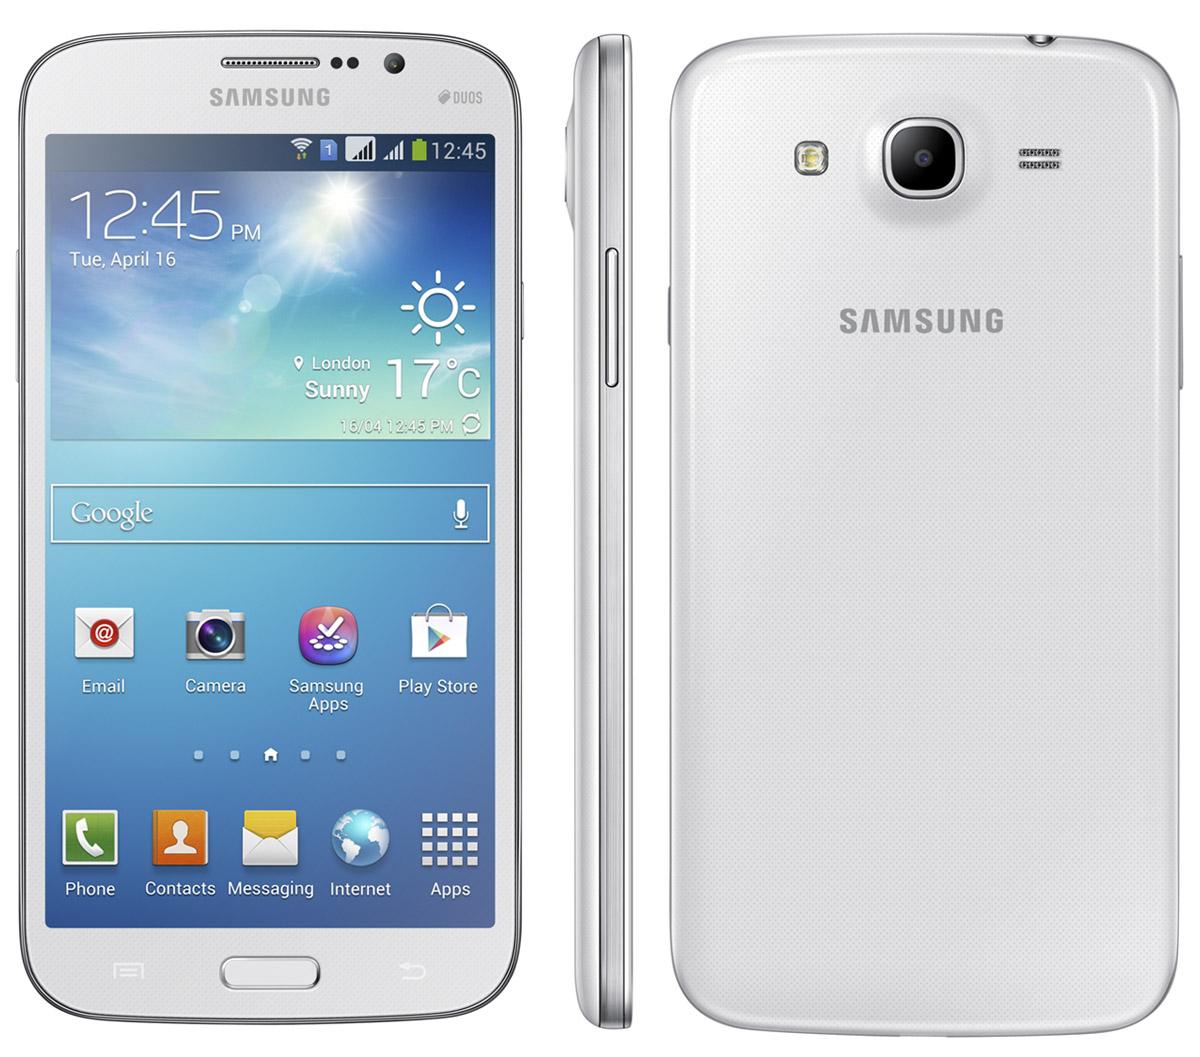 Внешний вид Samsung Galaxy Mega 5.8 I9150